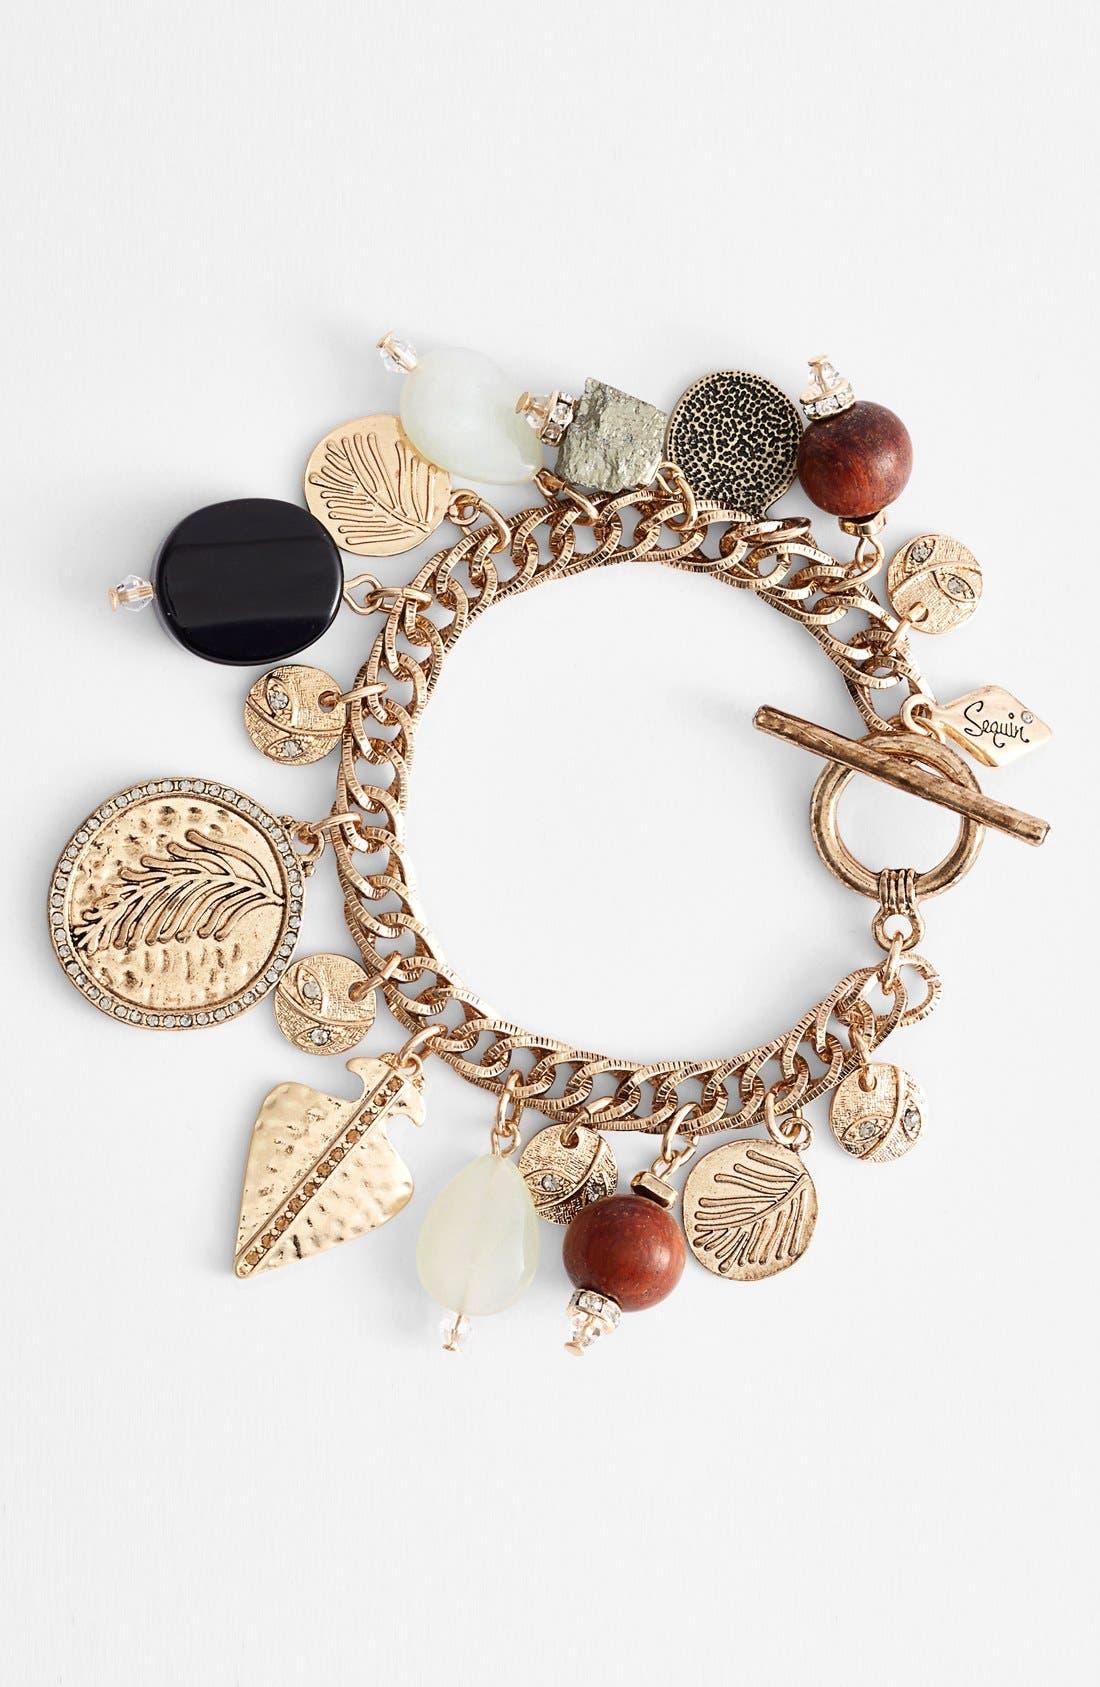 Alternate Image 1 Selected - Sequin 'Sealife' Charm Bracelet